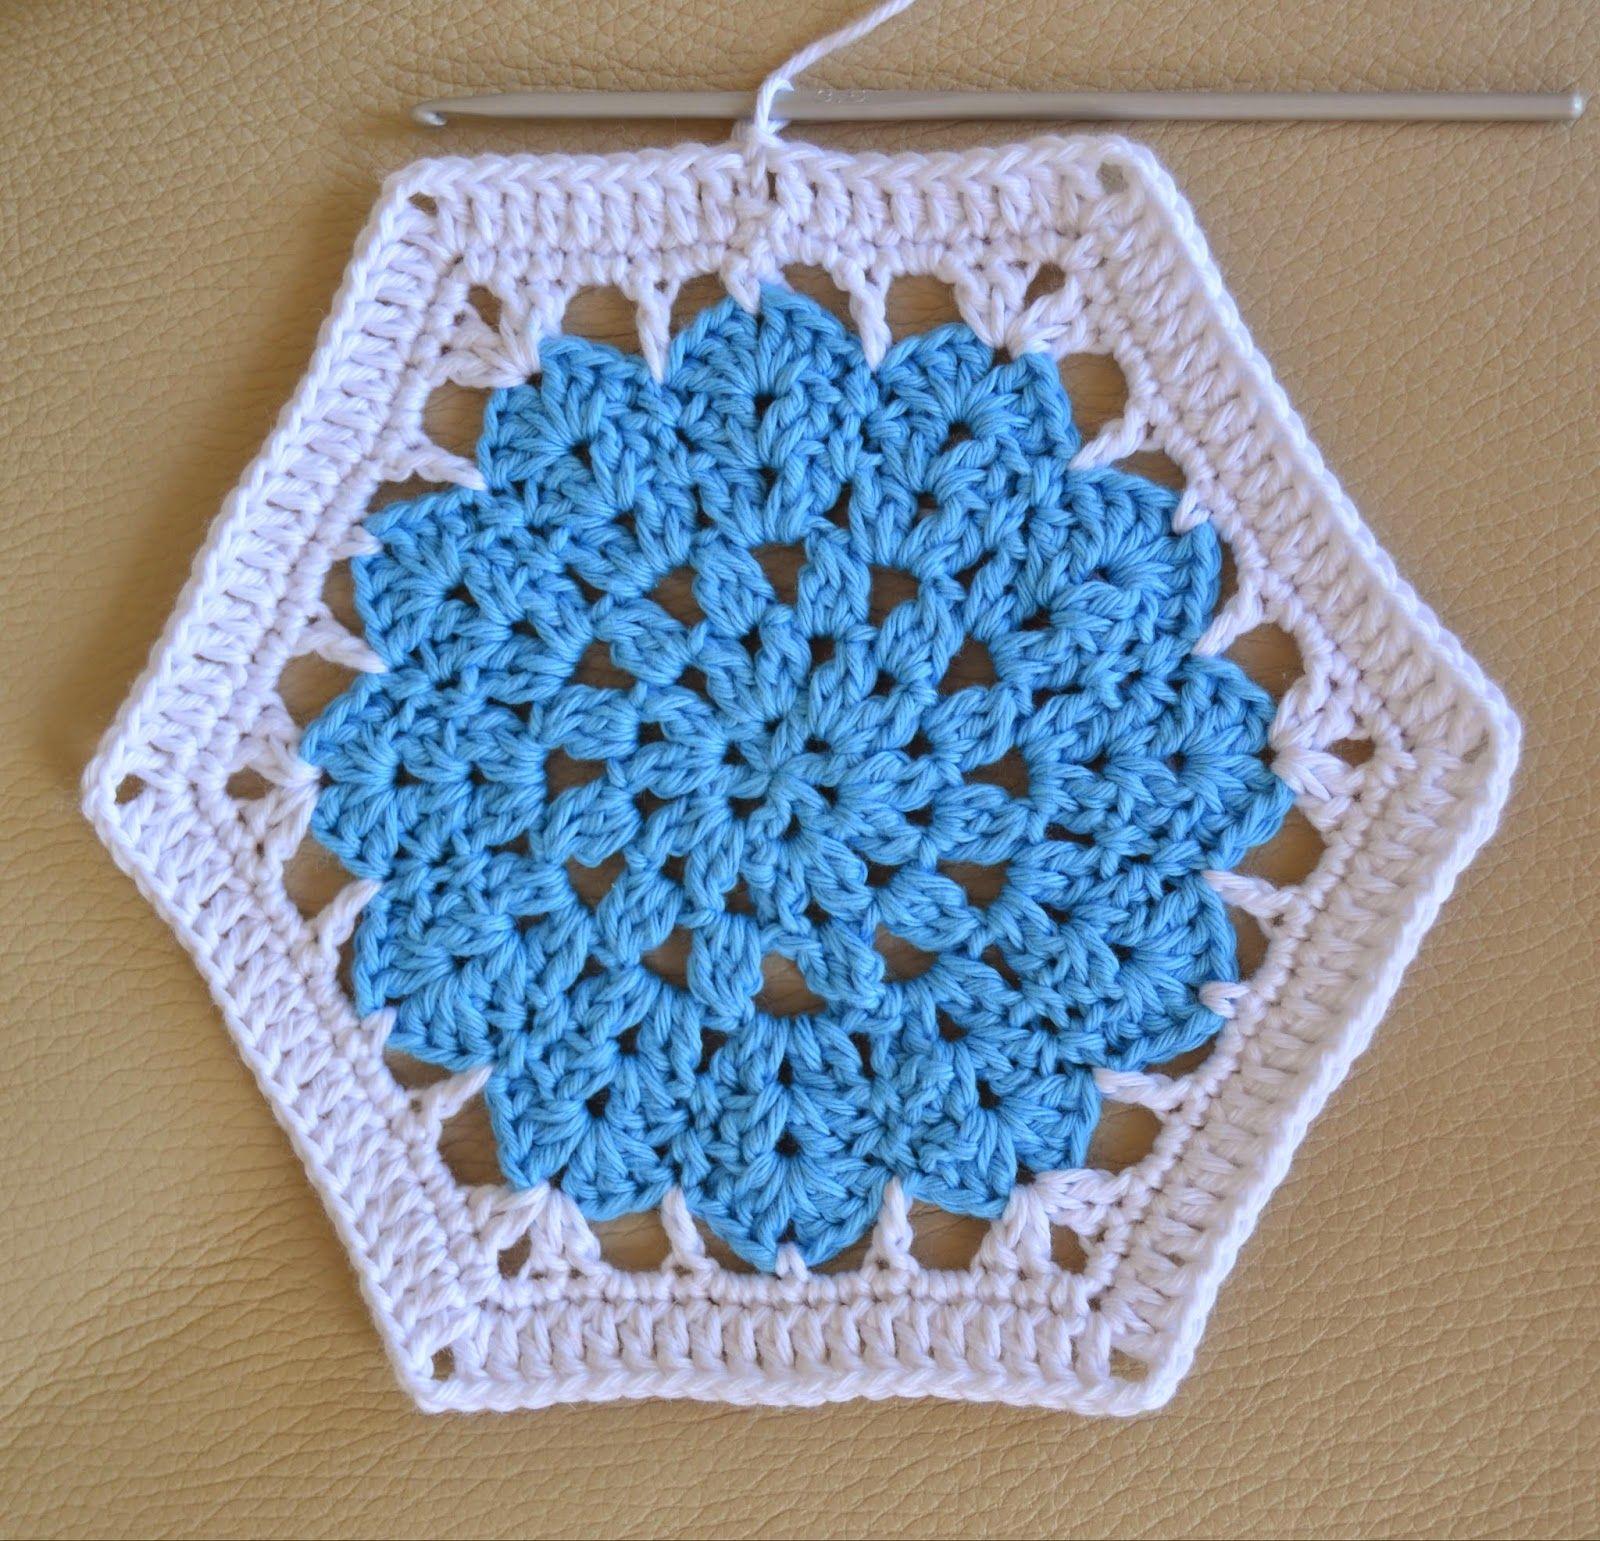 Atelier Marie-Lucienne: Häkeln/Crochet | ТУРЕЦКАЯ ПЛИТКА | Pinterest ...